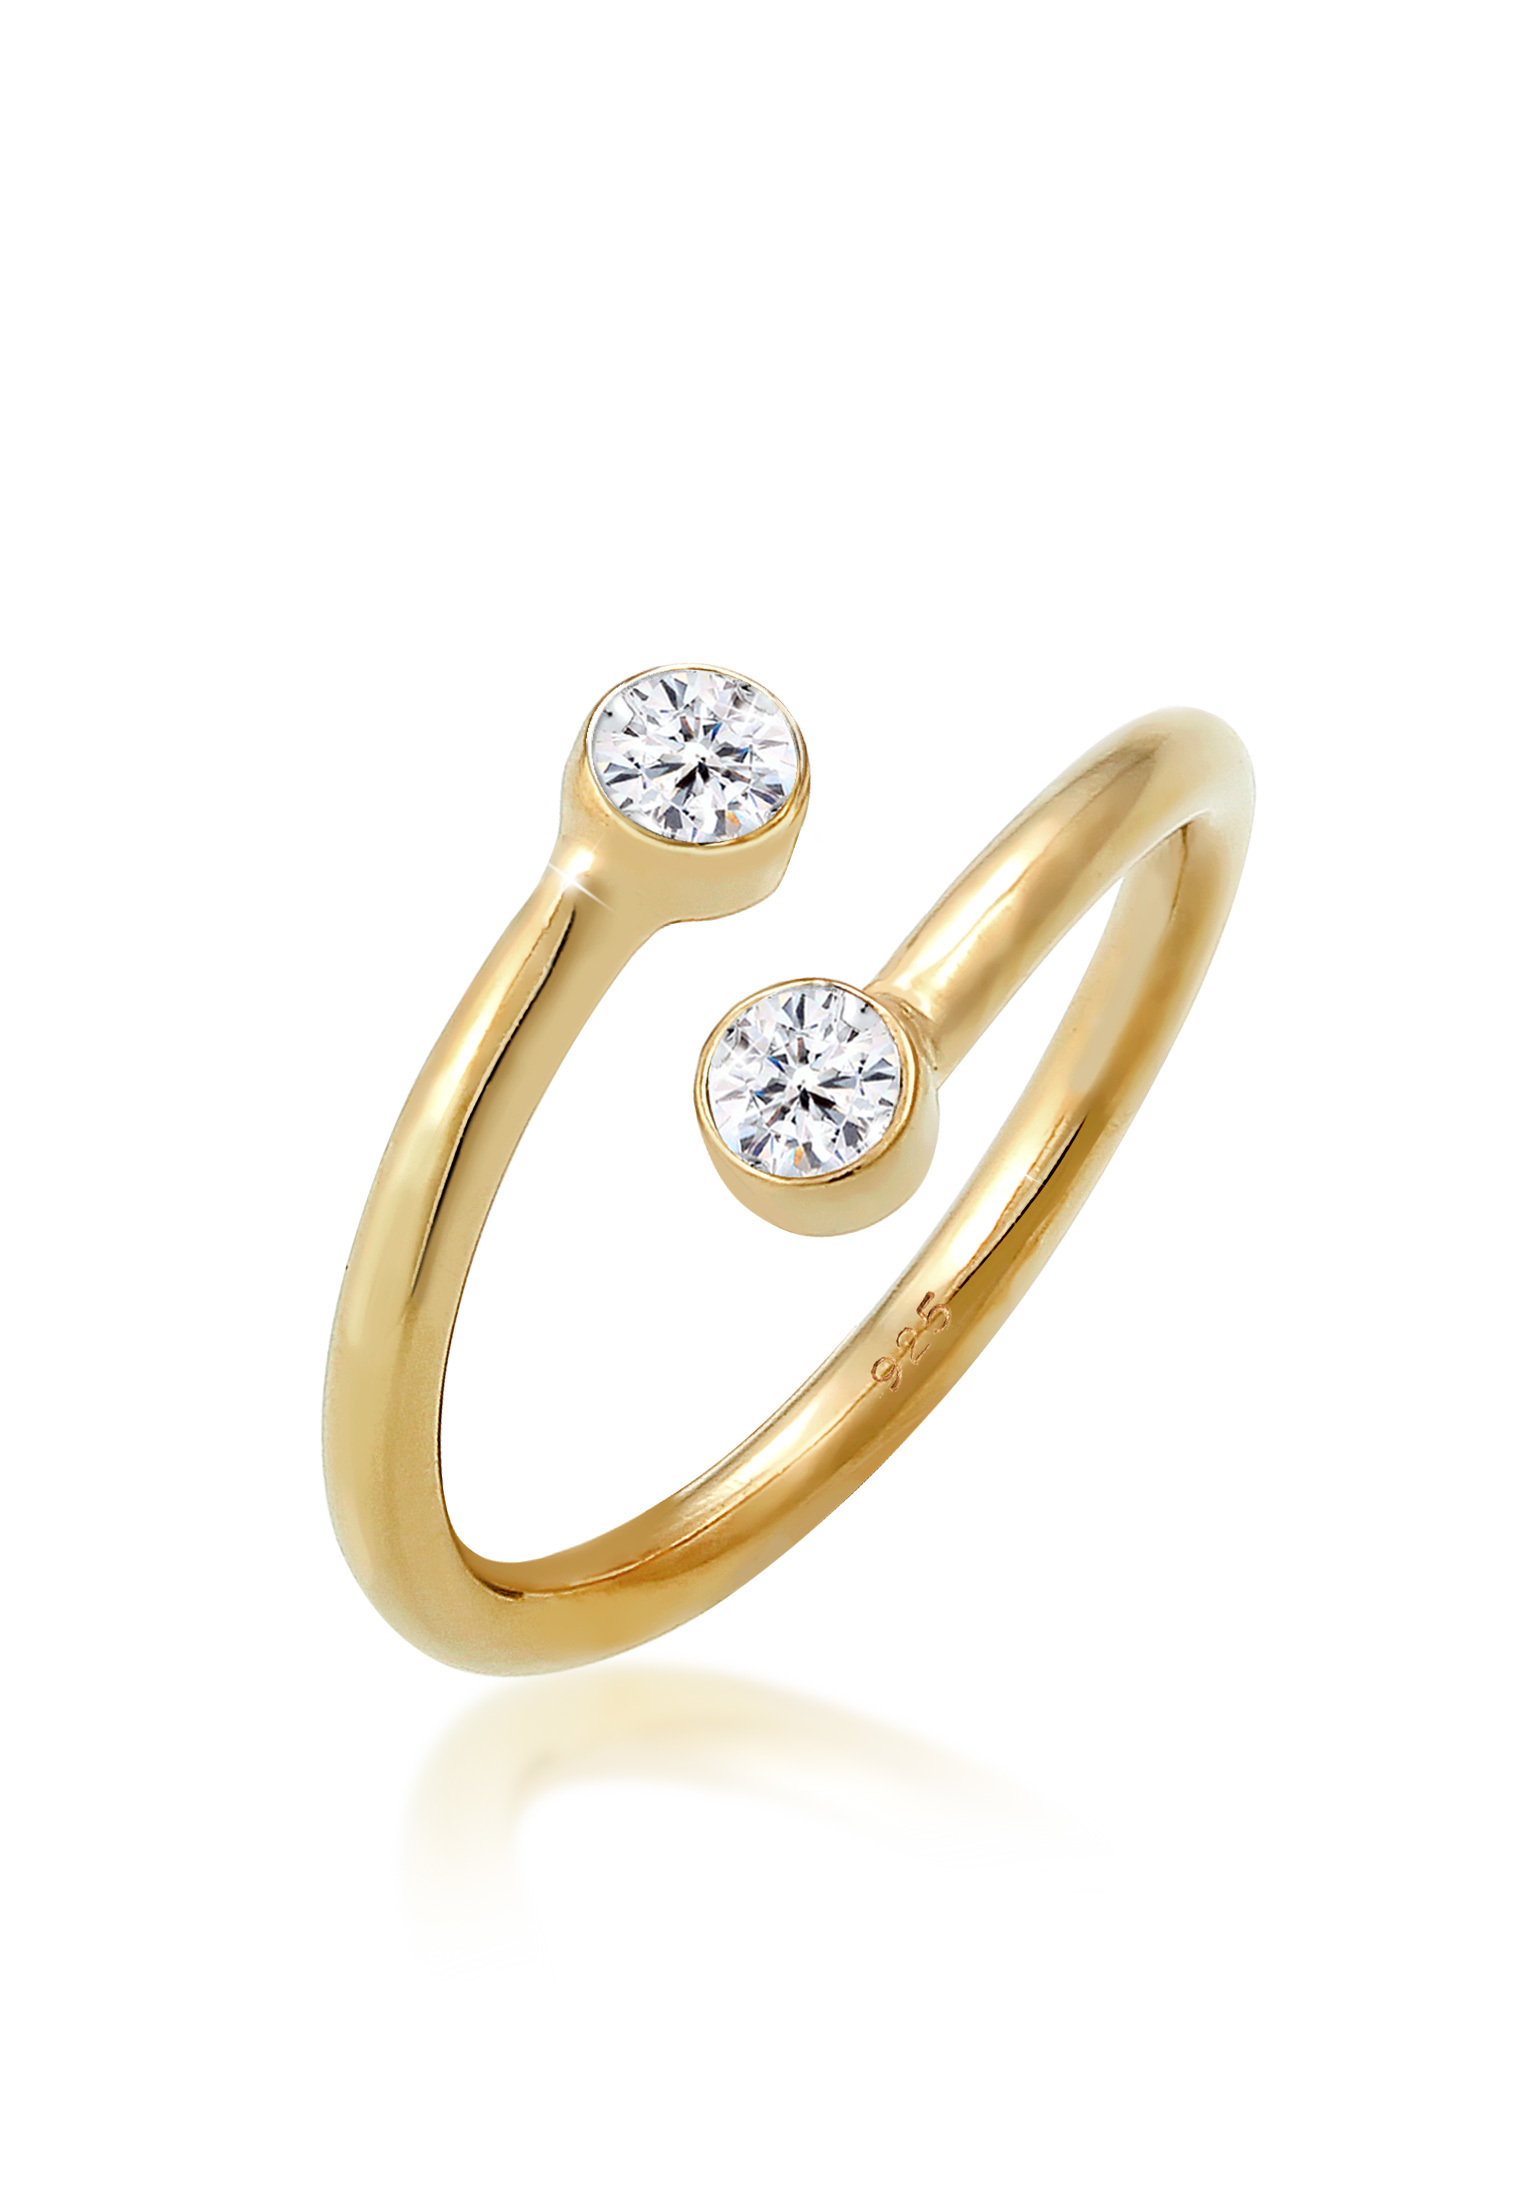 Wickelring | Kristall ( Weiß ) | 925 Sterling Silber vergoldet